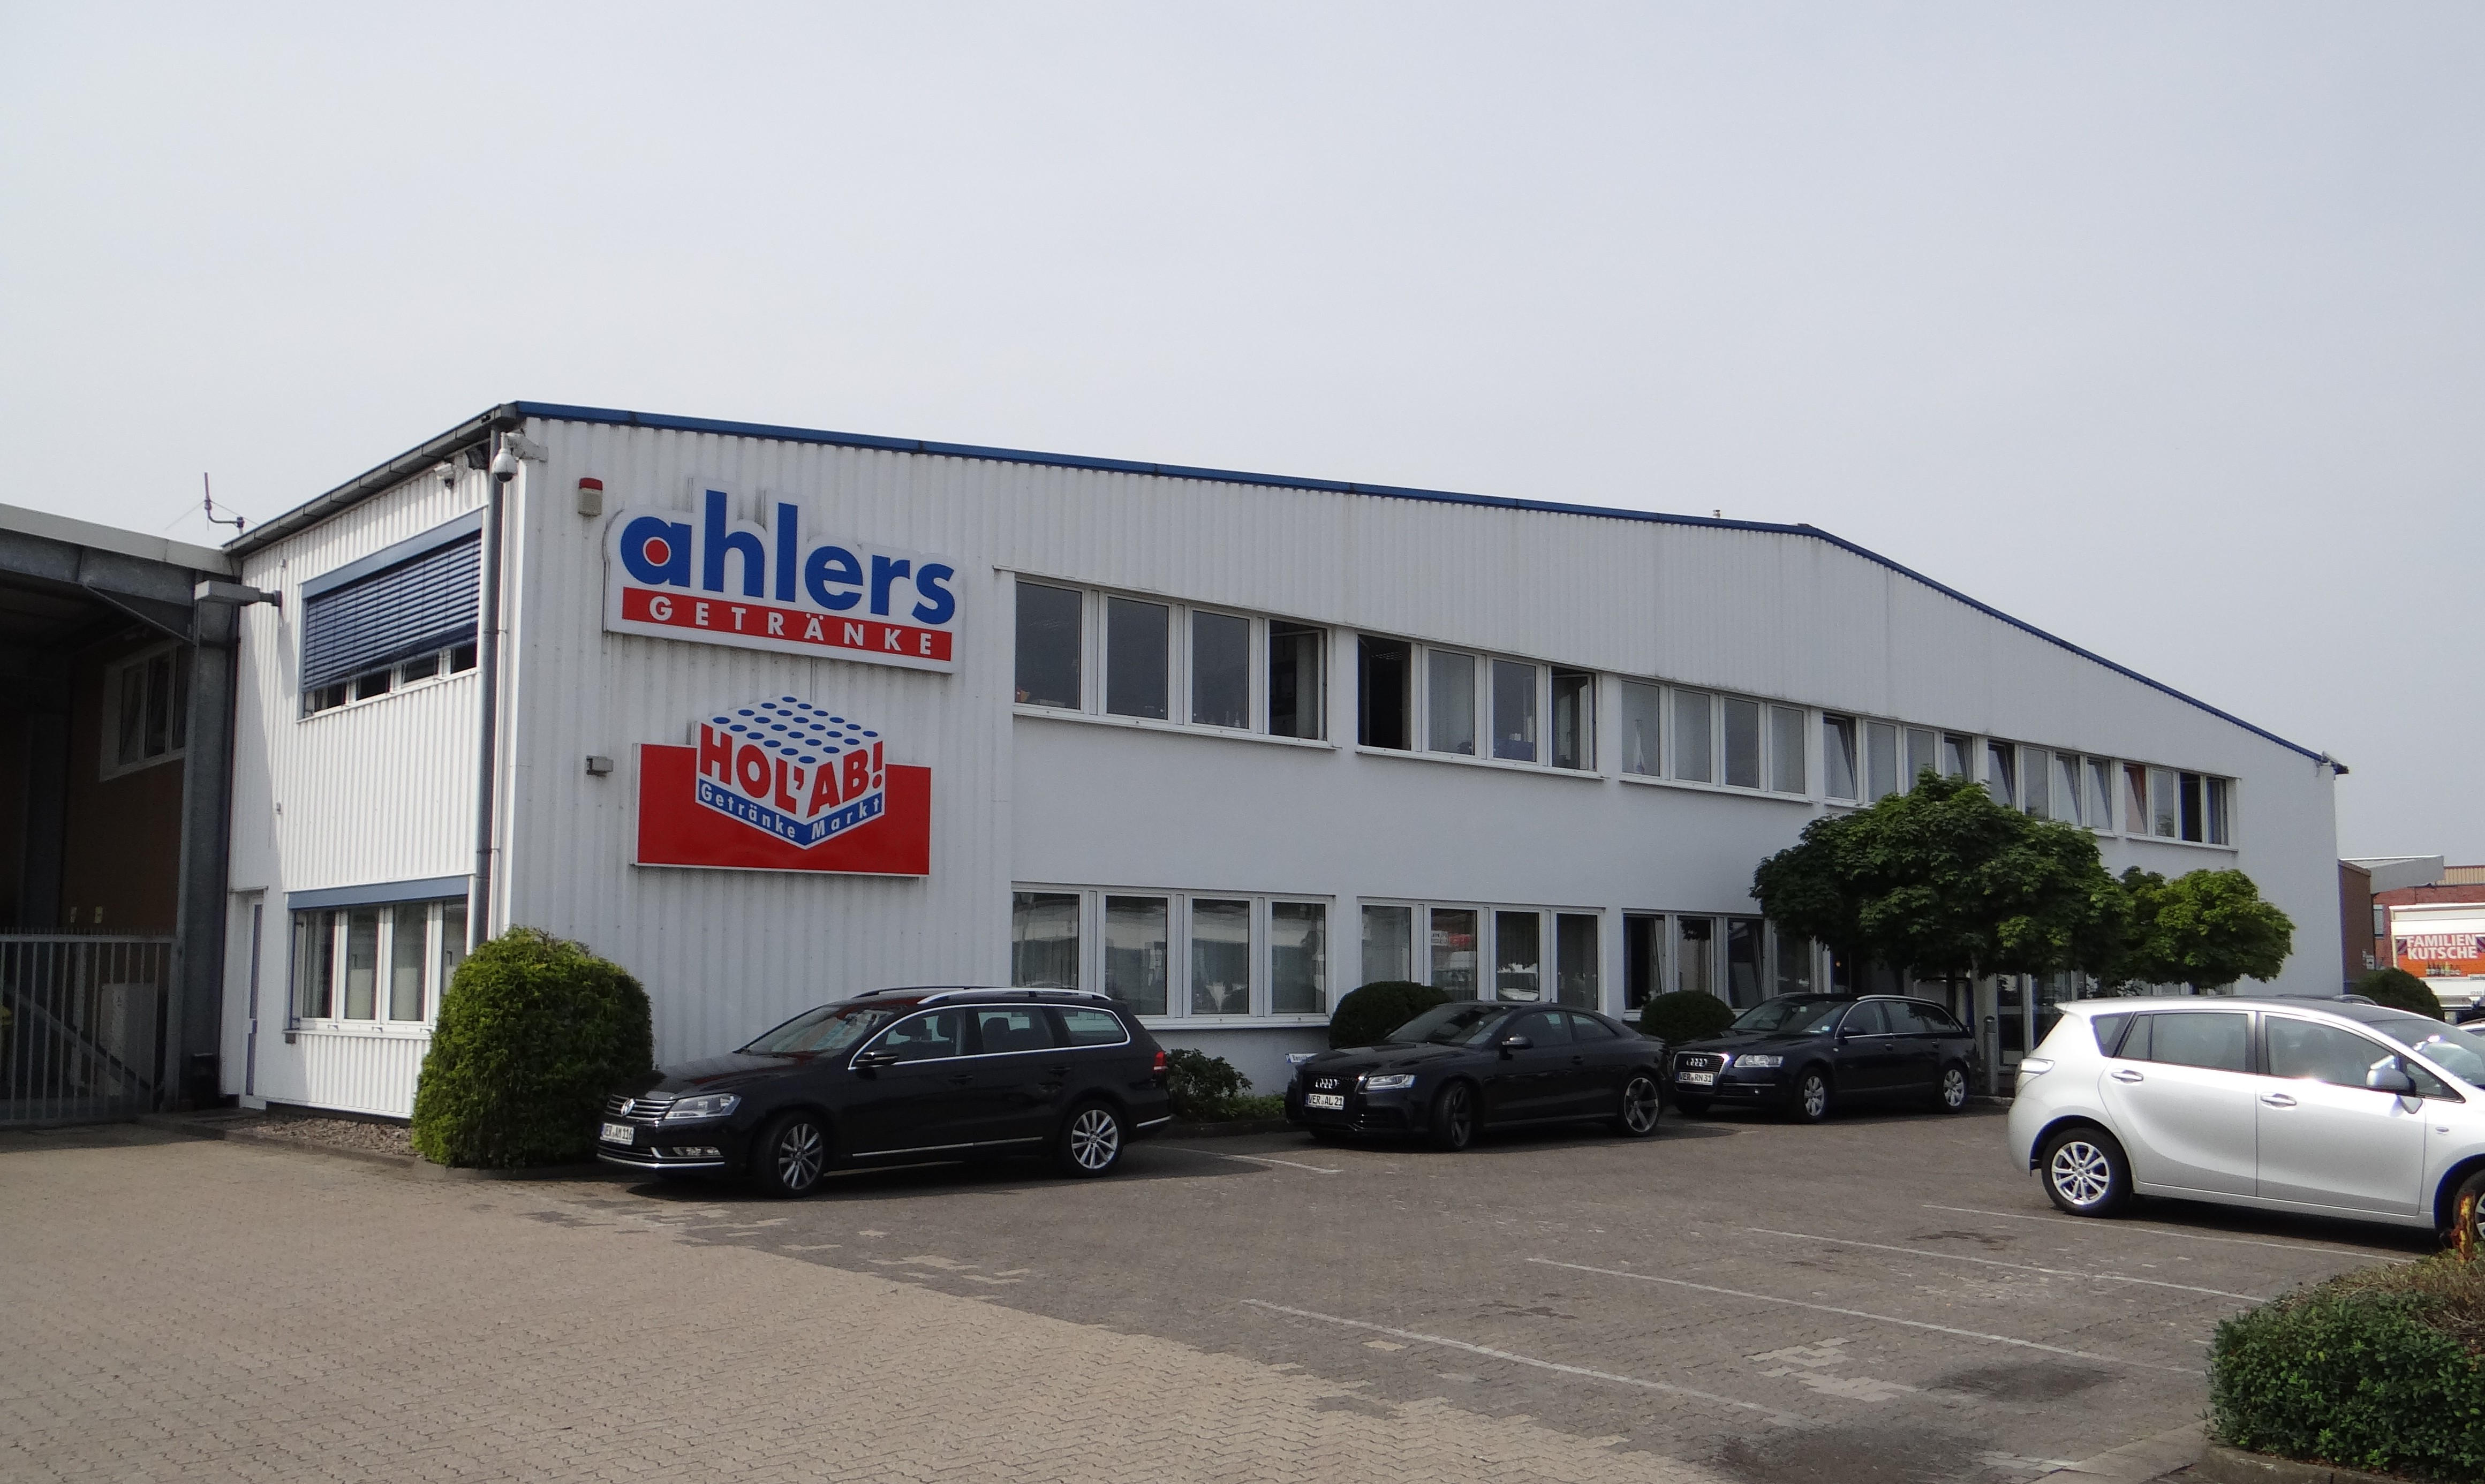 Datei:Getränke Ahlers, Verwaltung in Achim, 2013.JPG – Wikipedia